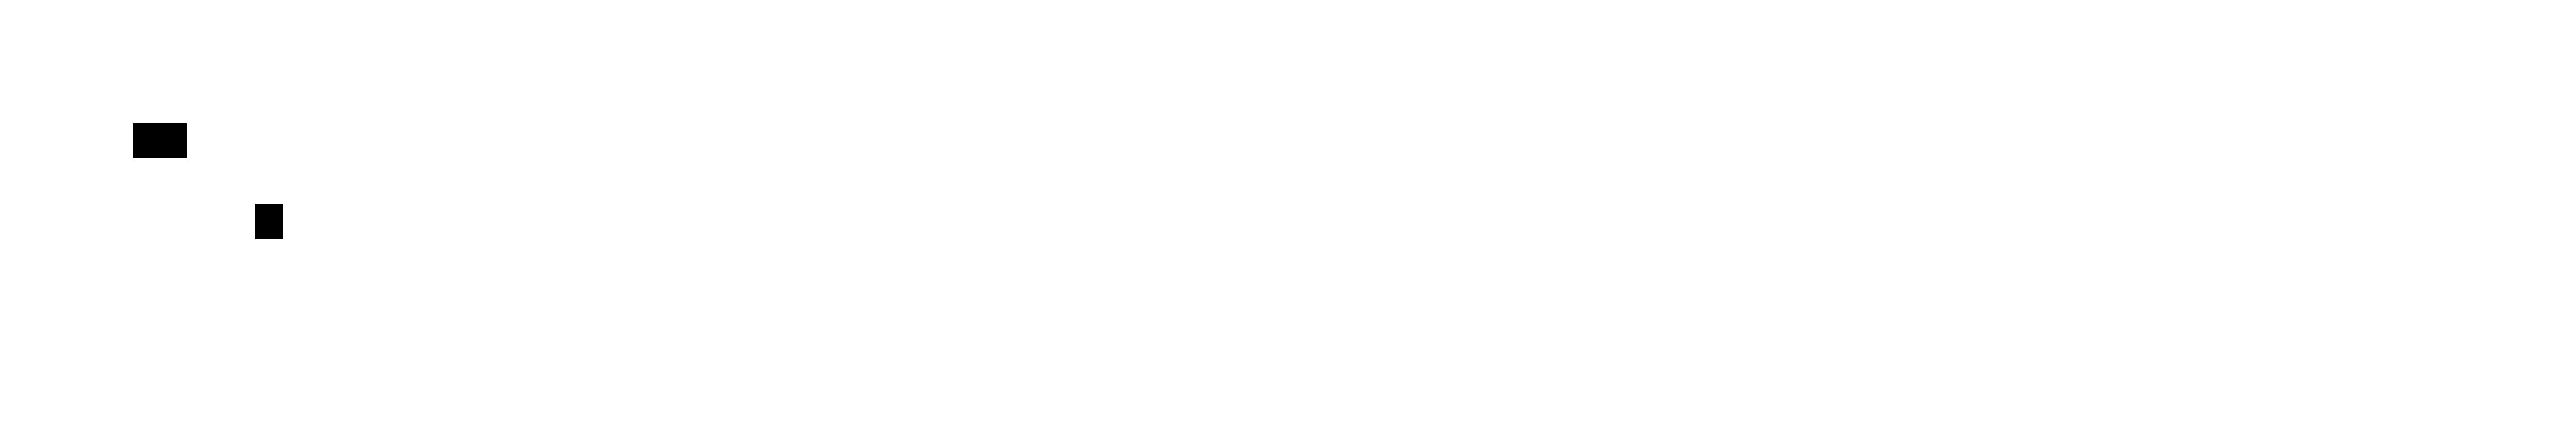 BrandBikes